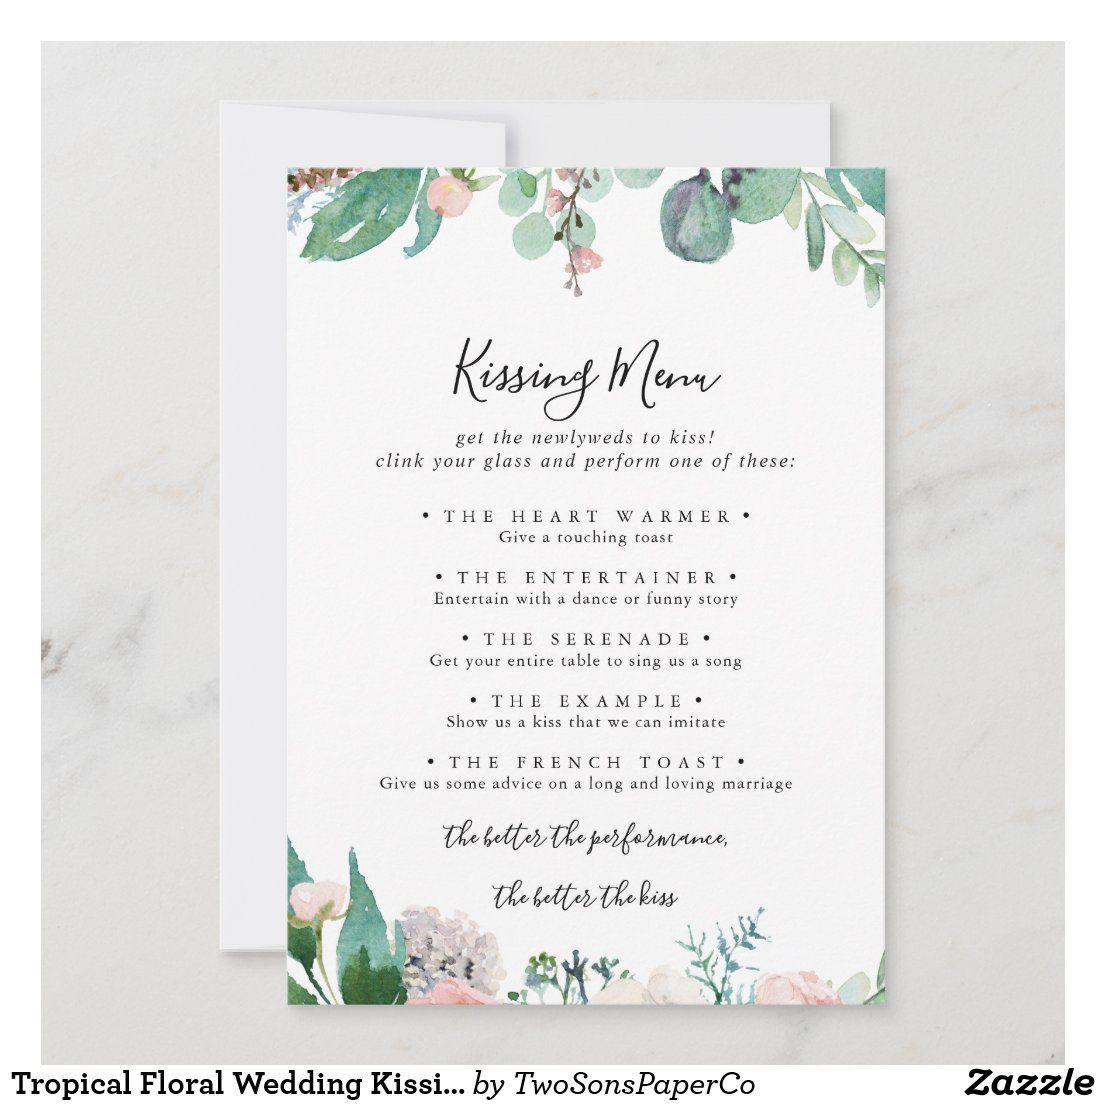 Tropical Floral Wedding Kissing Menu Game Card Zazzle Com Wedding Kissing Games Wedding Kiss Floral Wedding